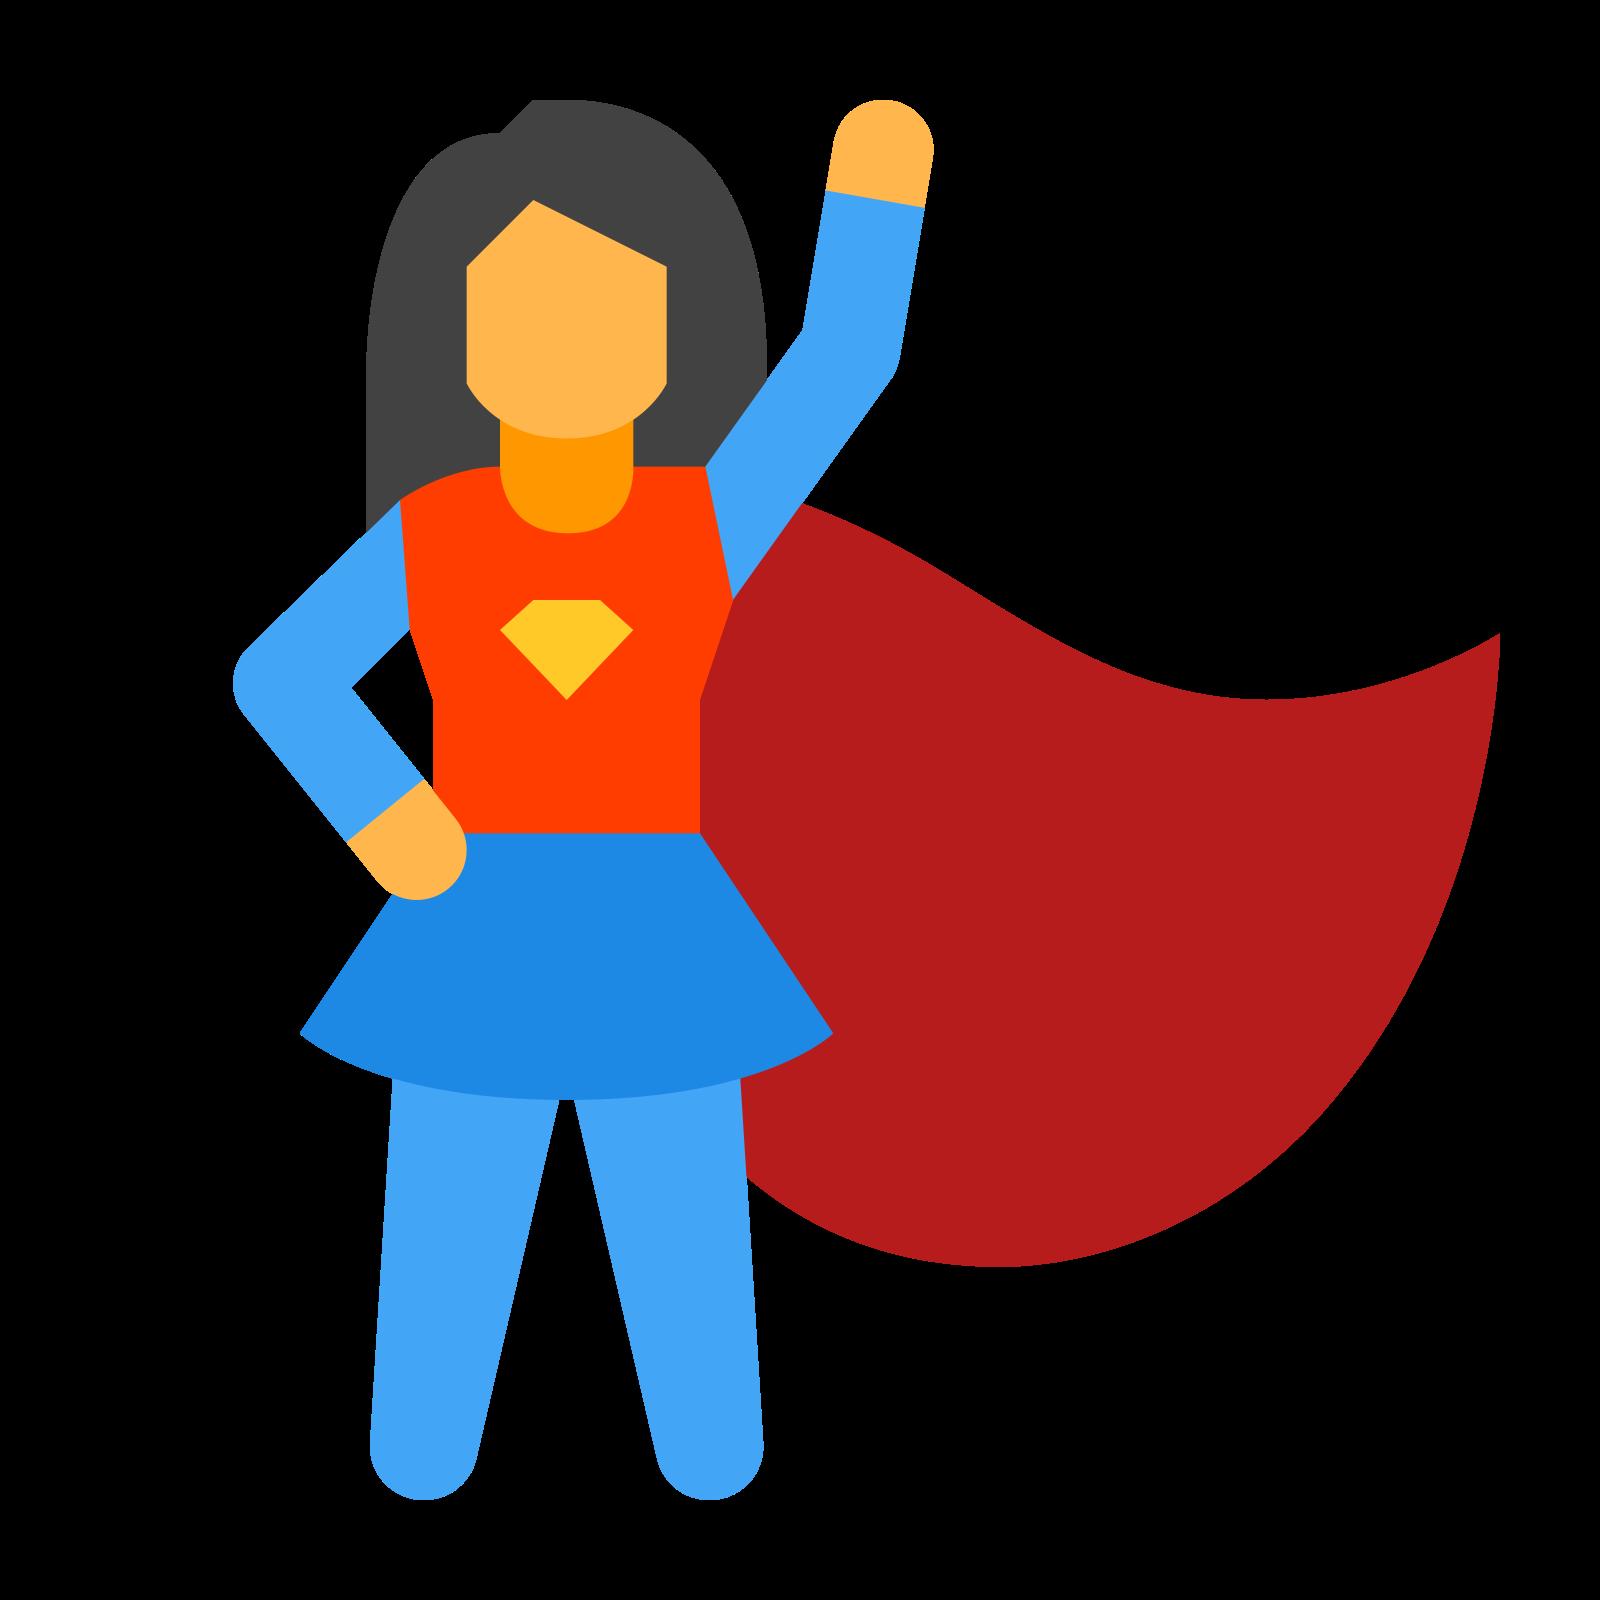 Super Hero Female icon